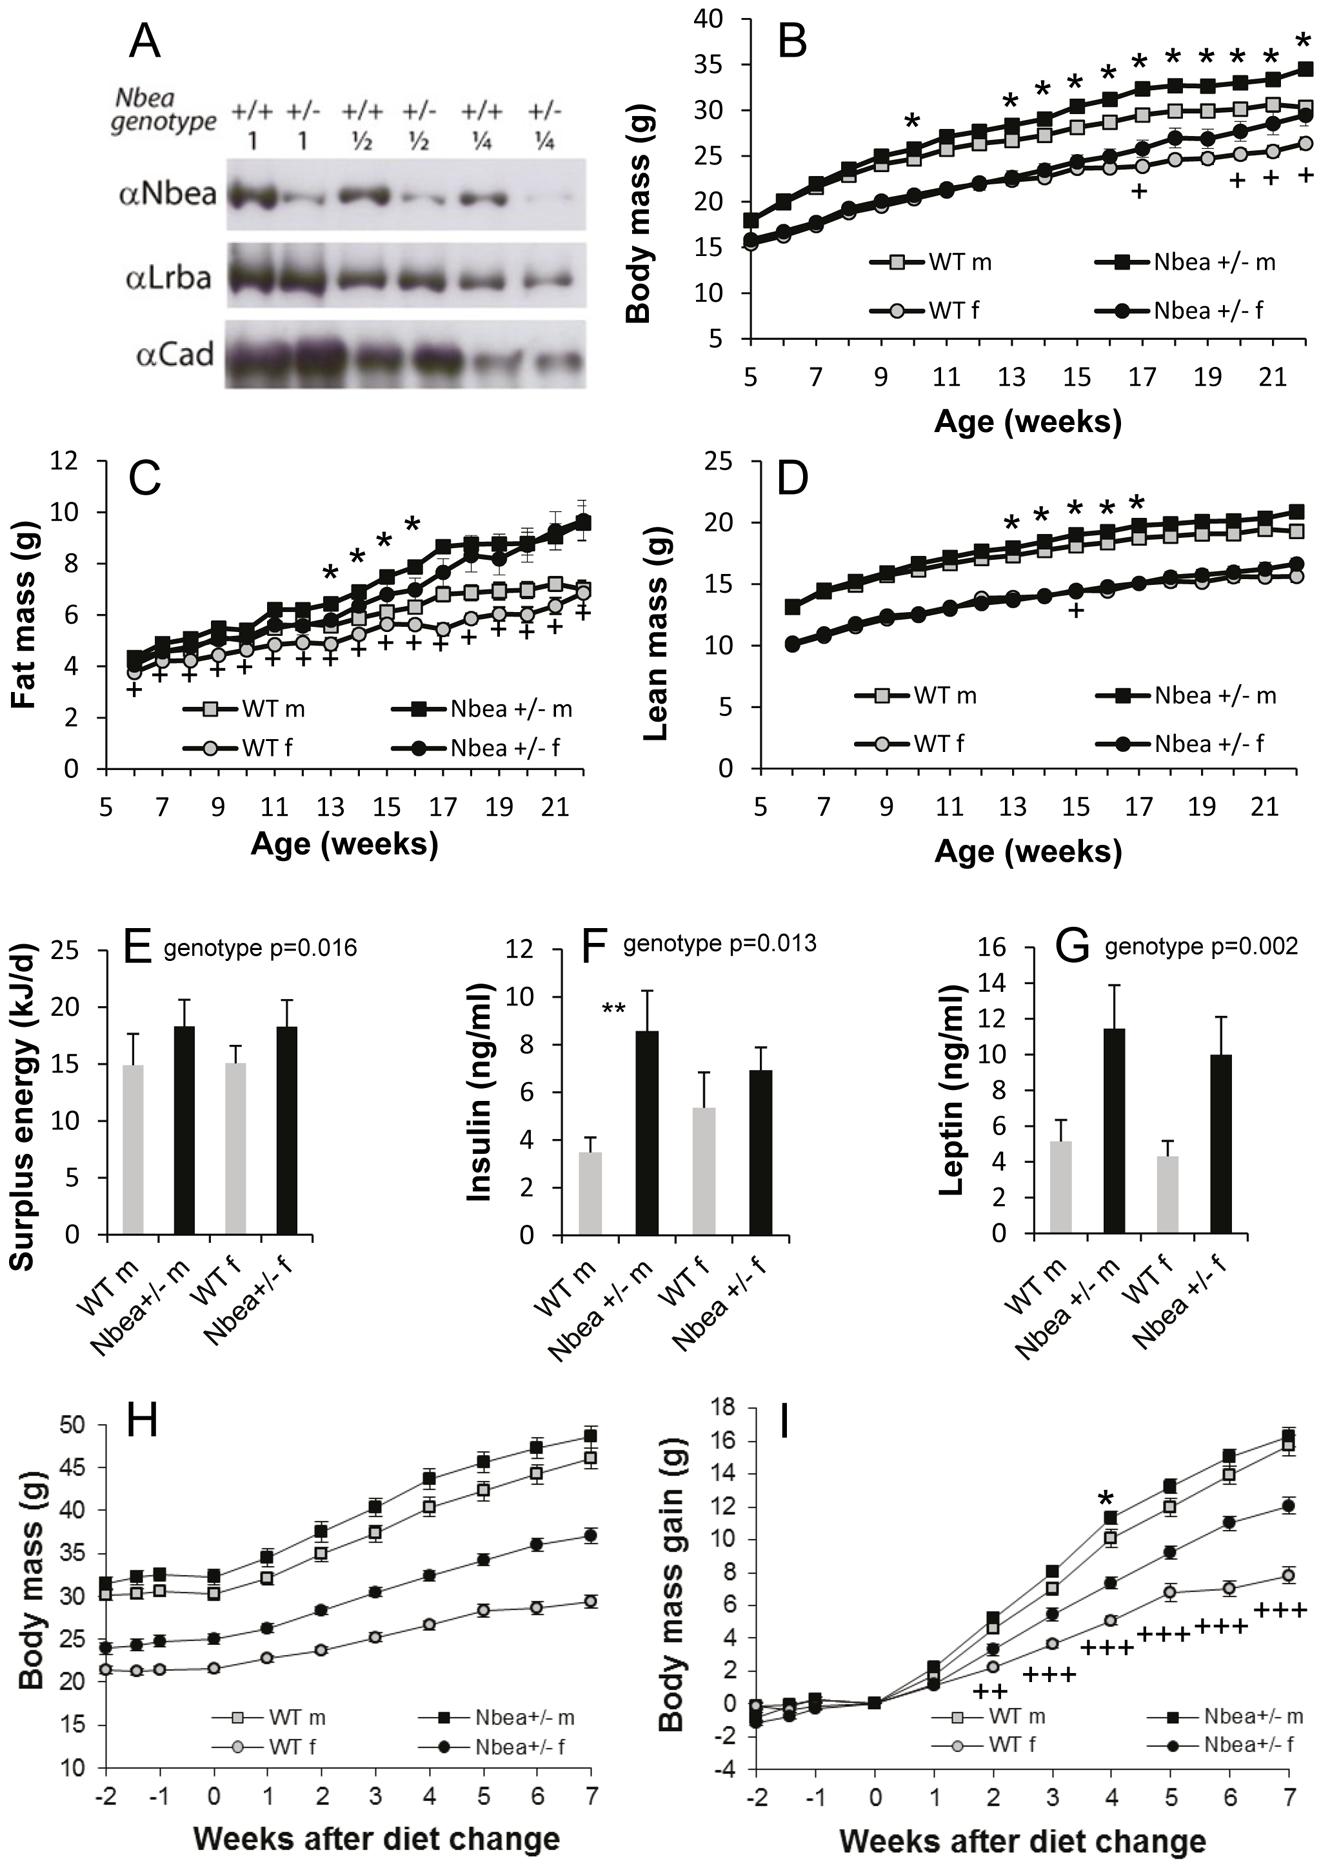 Nbea-haploinsufficient mice develop higher body weight due to higher adipose tissue mass.